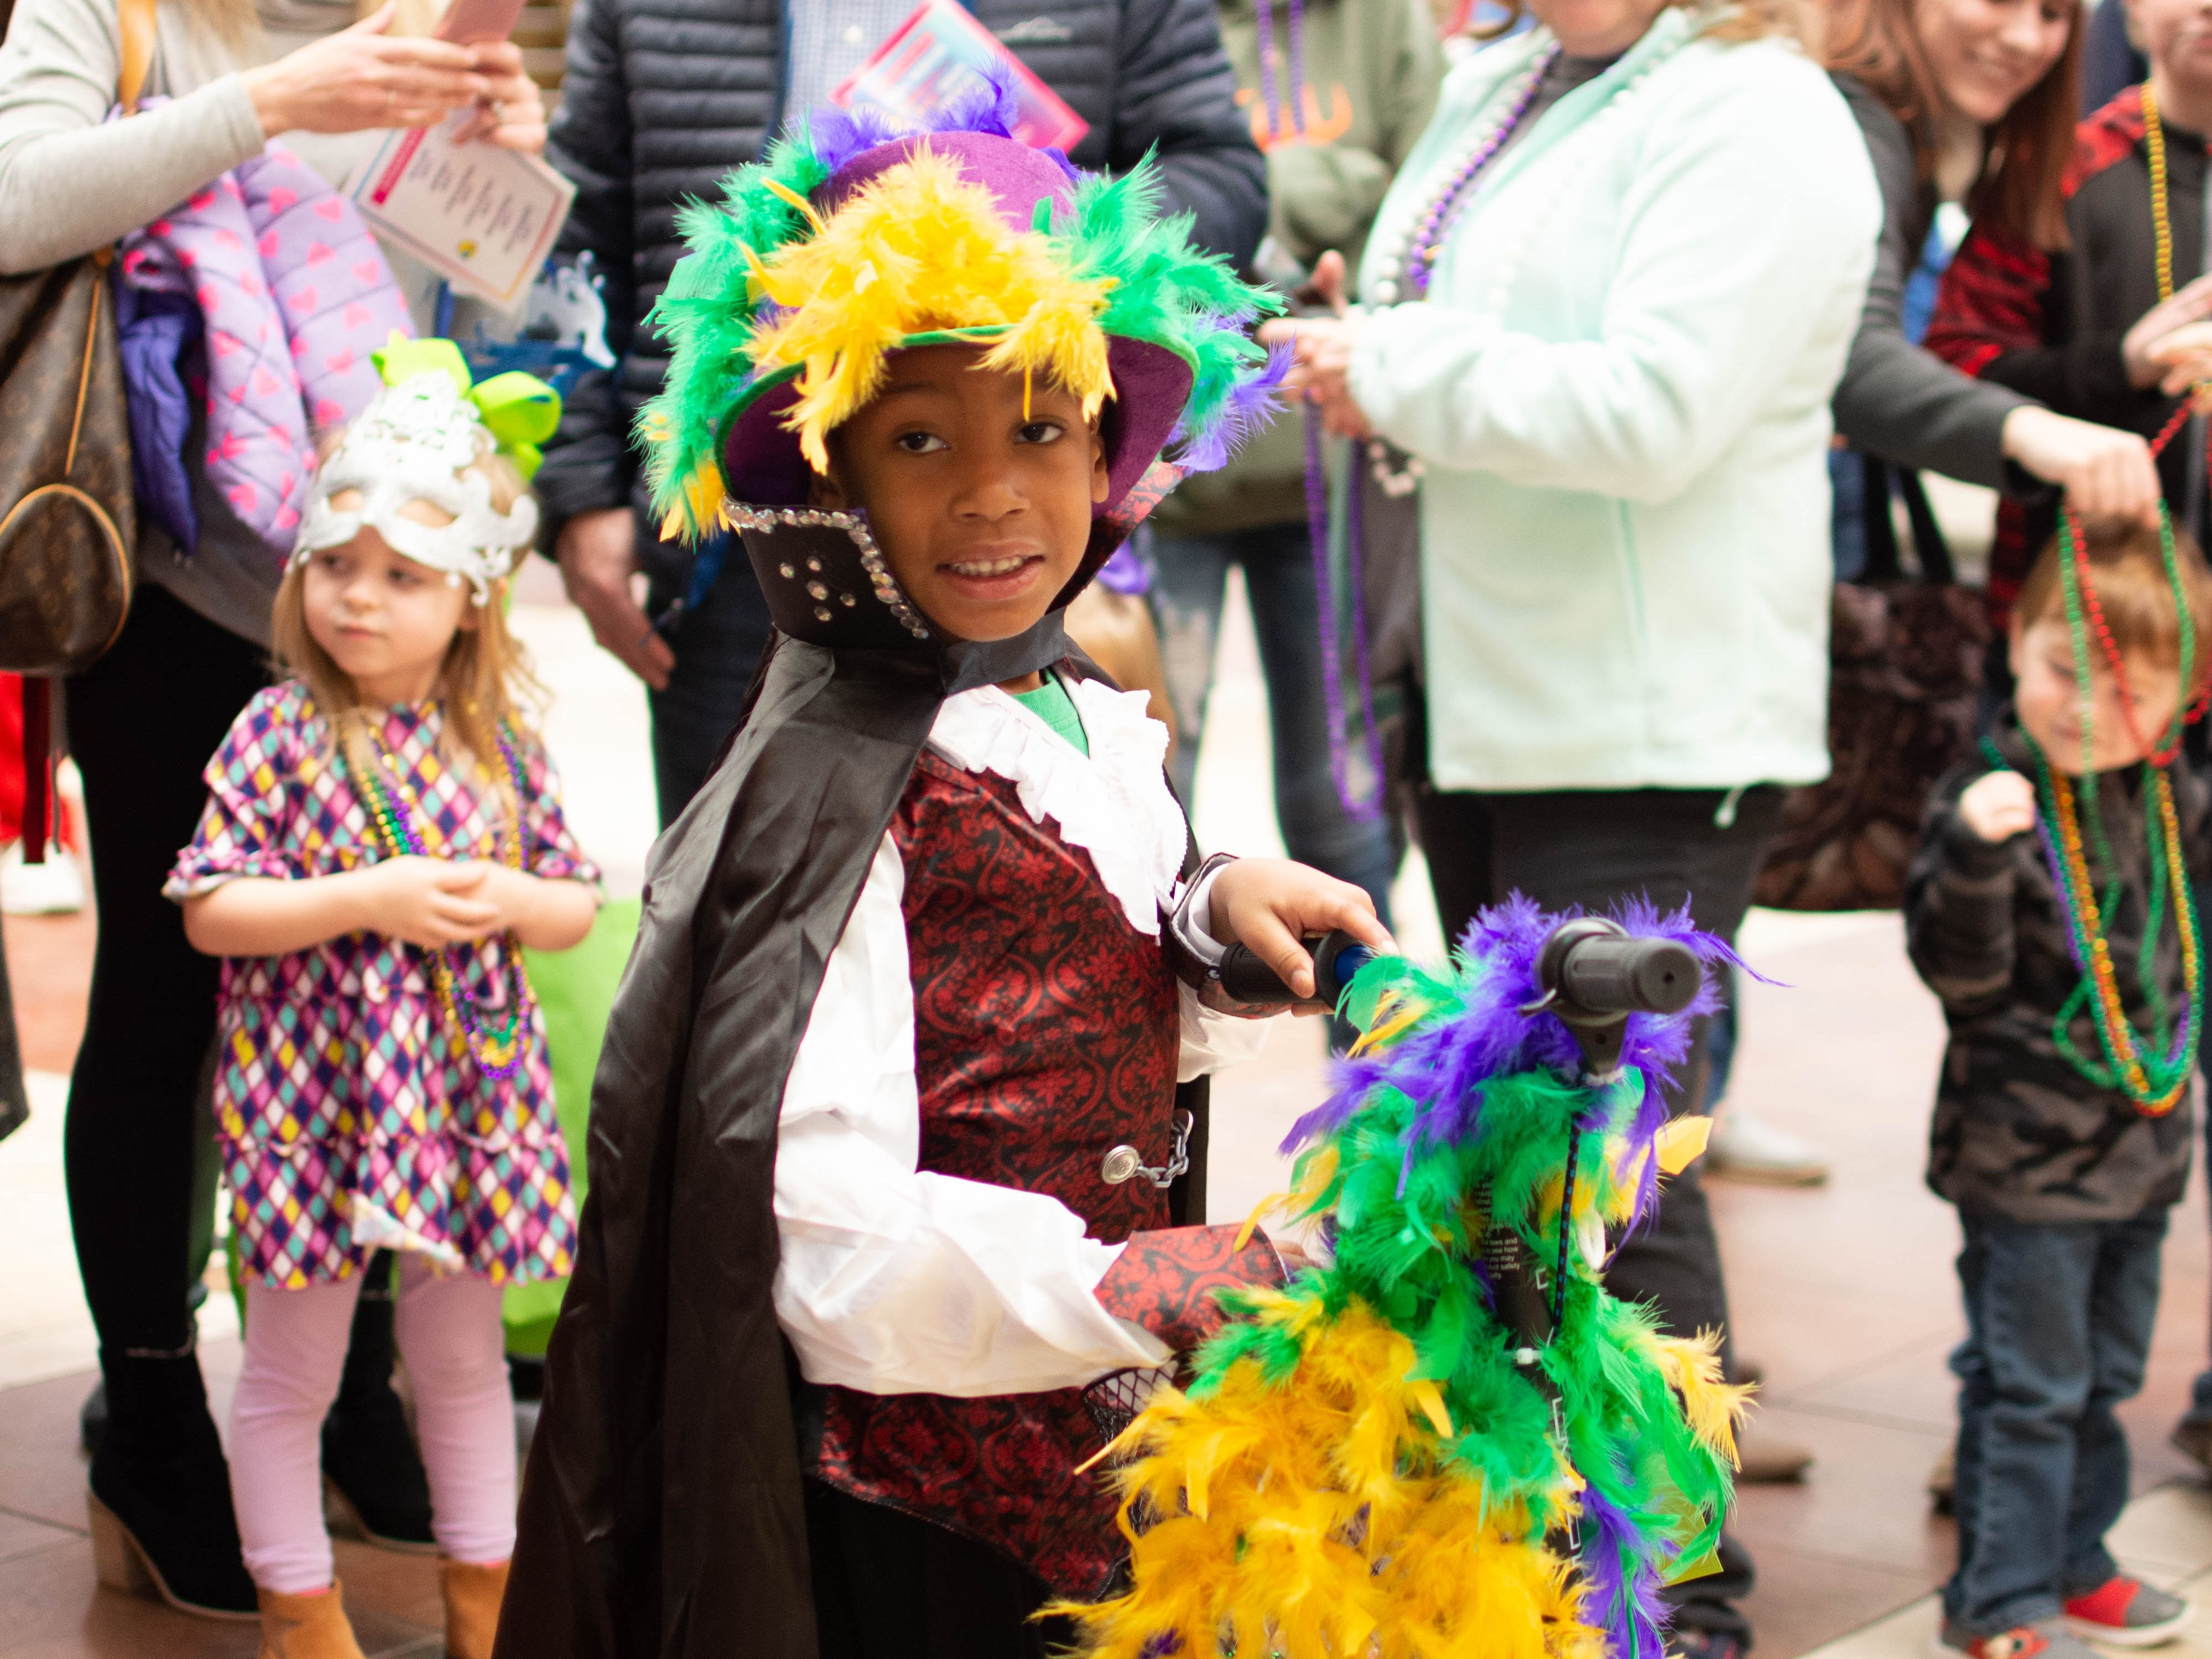 The Krewe of Janus held a children's Mardi Gras parade at the Pecanland Mall in Monroe, La. on Feb. 16.